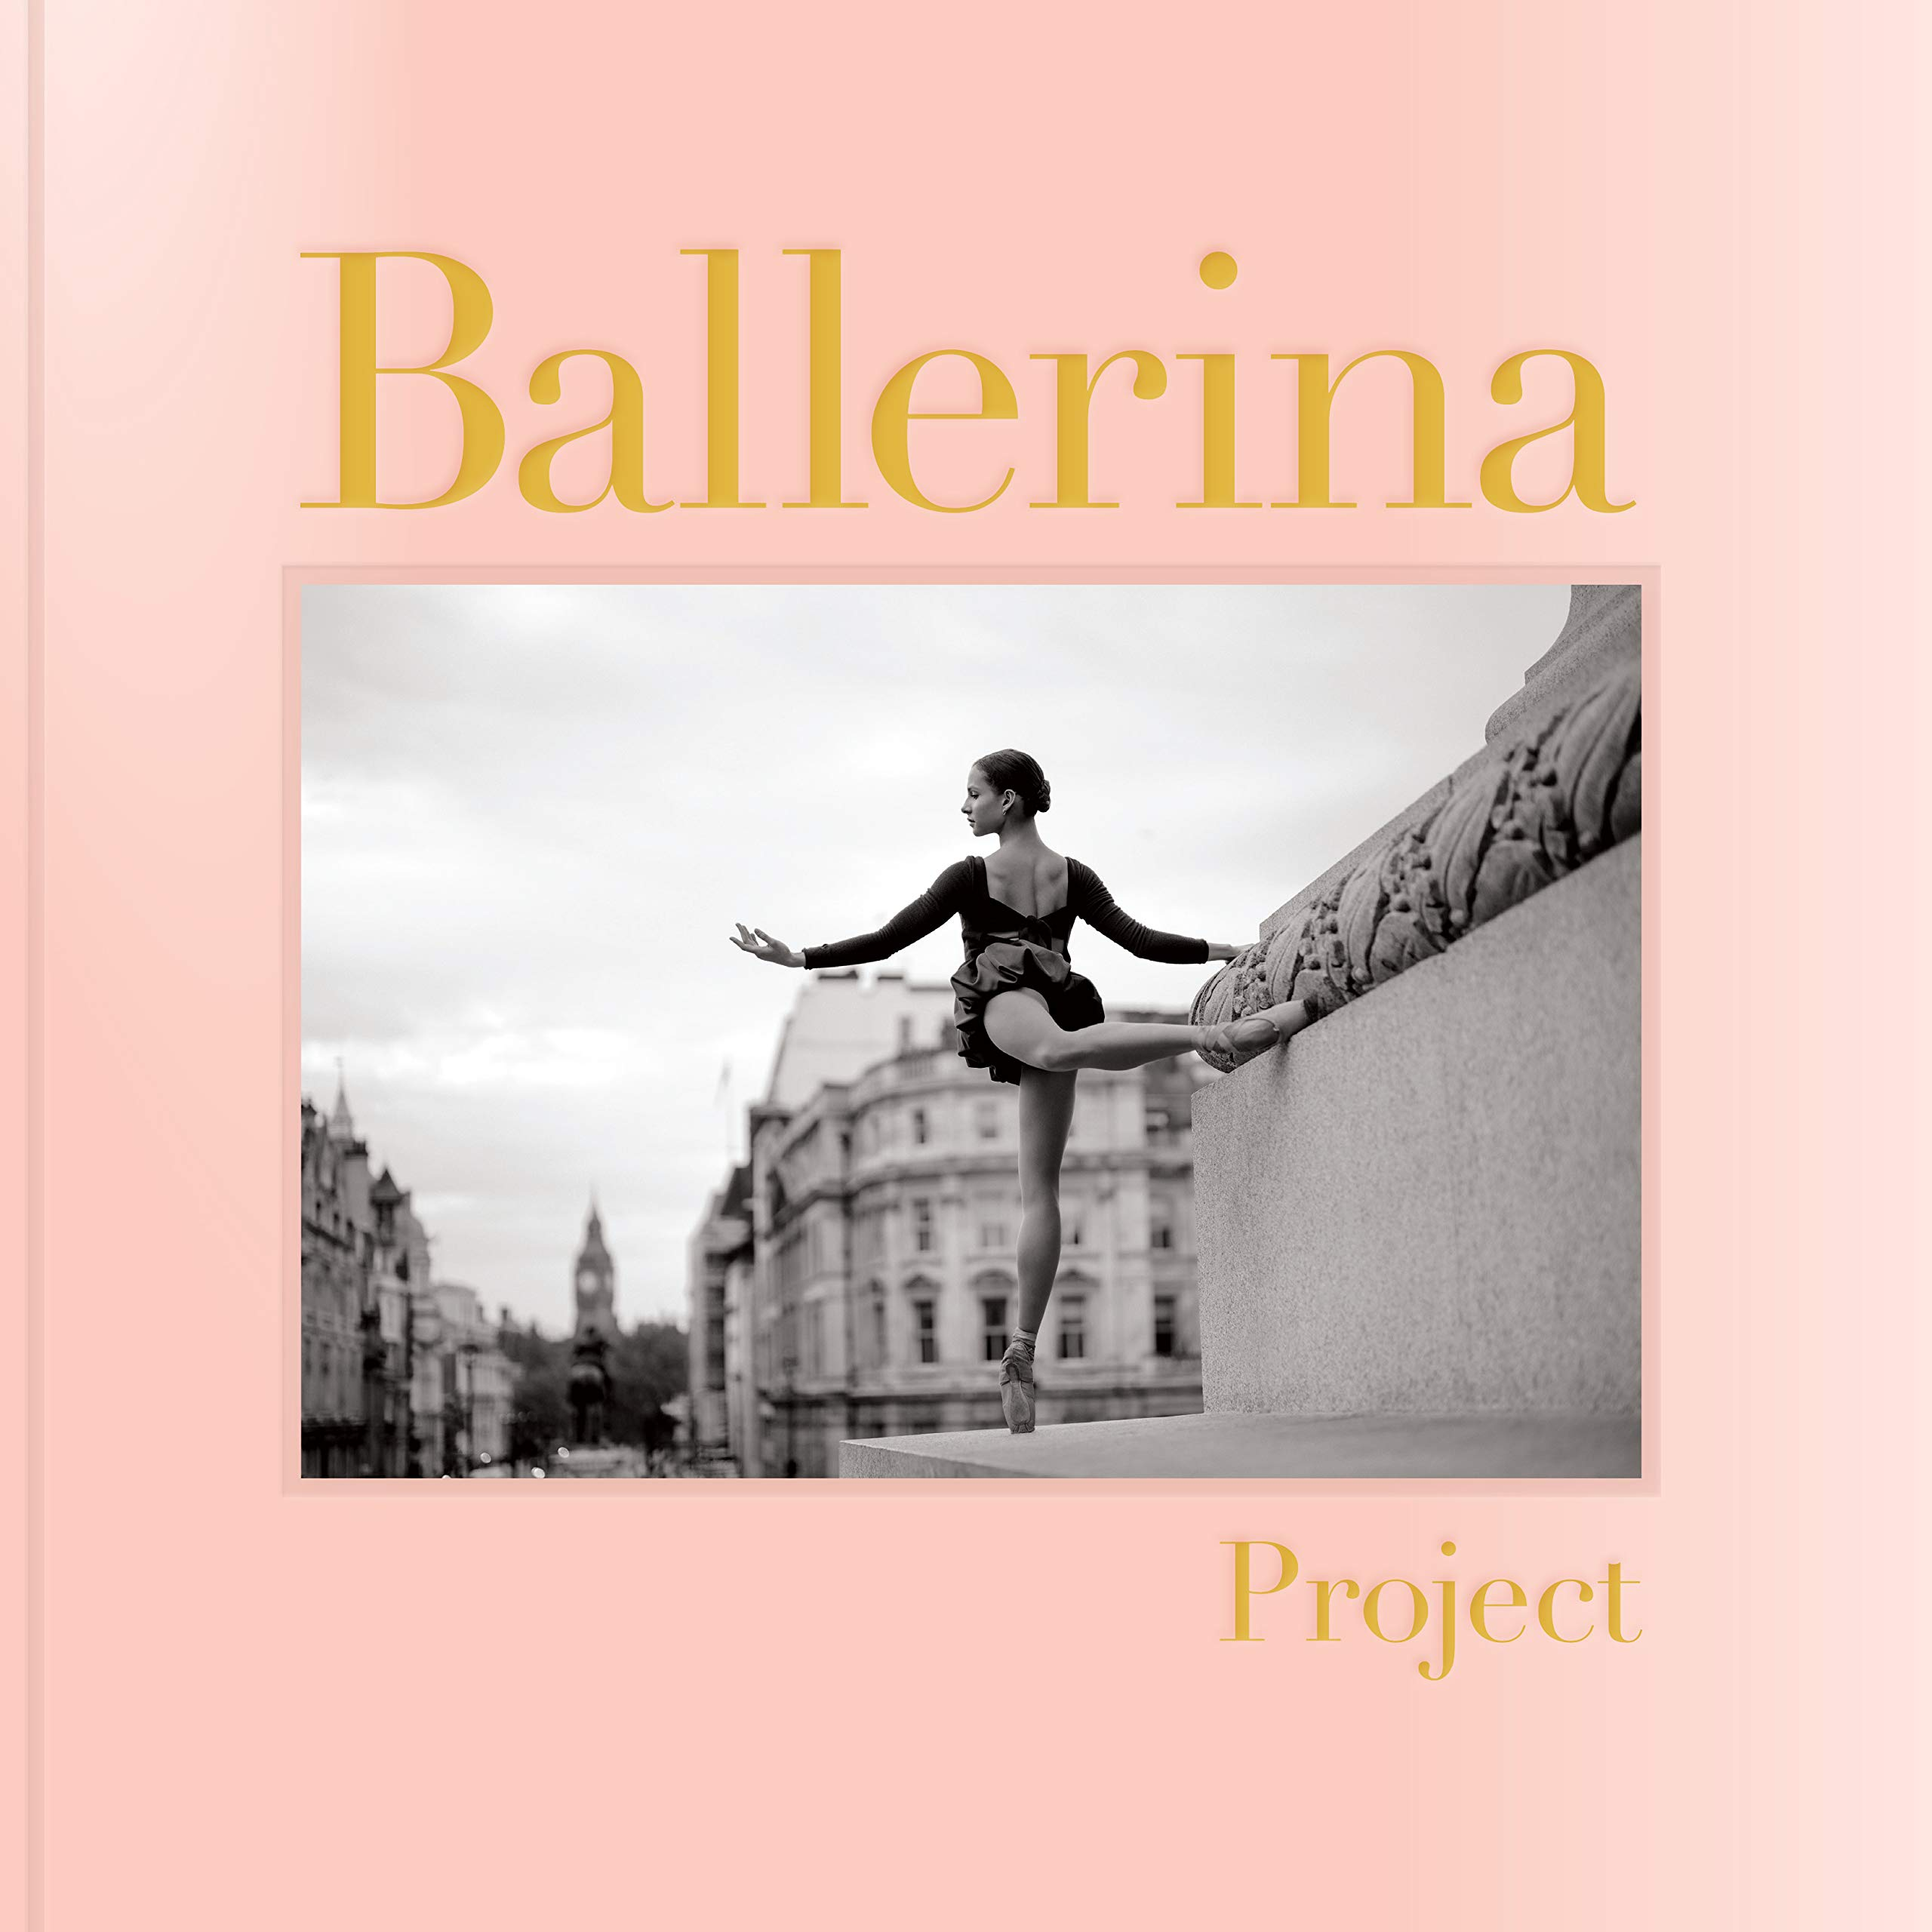 Ballerina Project: (Ballerina Photography Books, Art Fashion Books, Dance Photography) by Chronicle Chroma